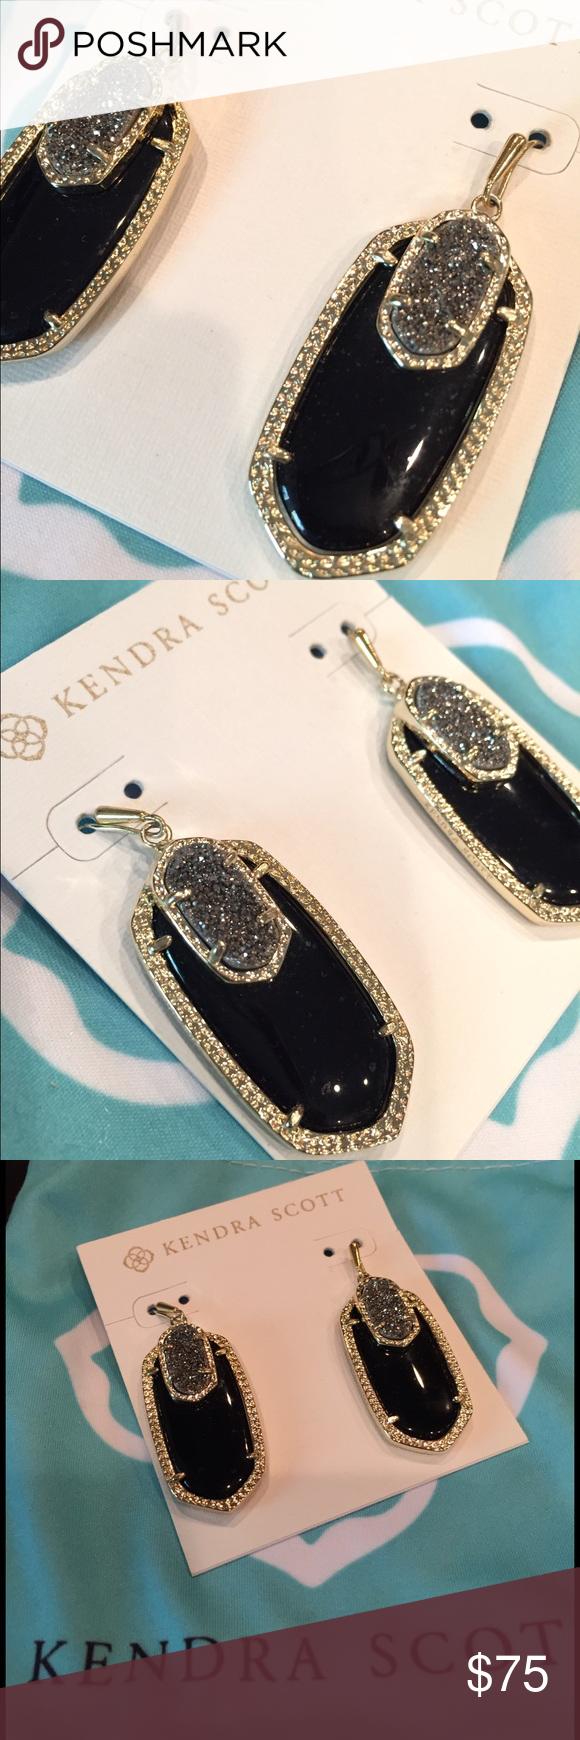 16++ Who sales kendra scott jewelry info